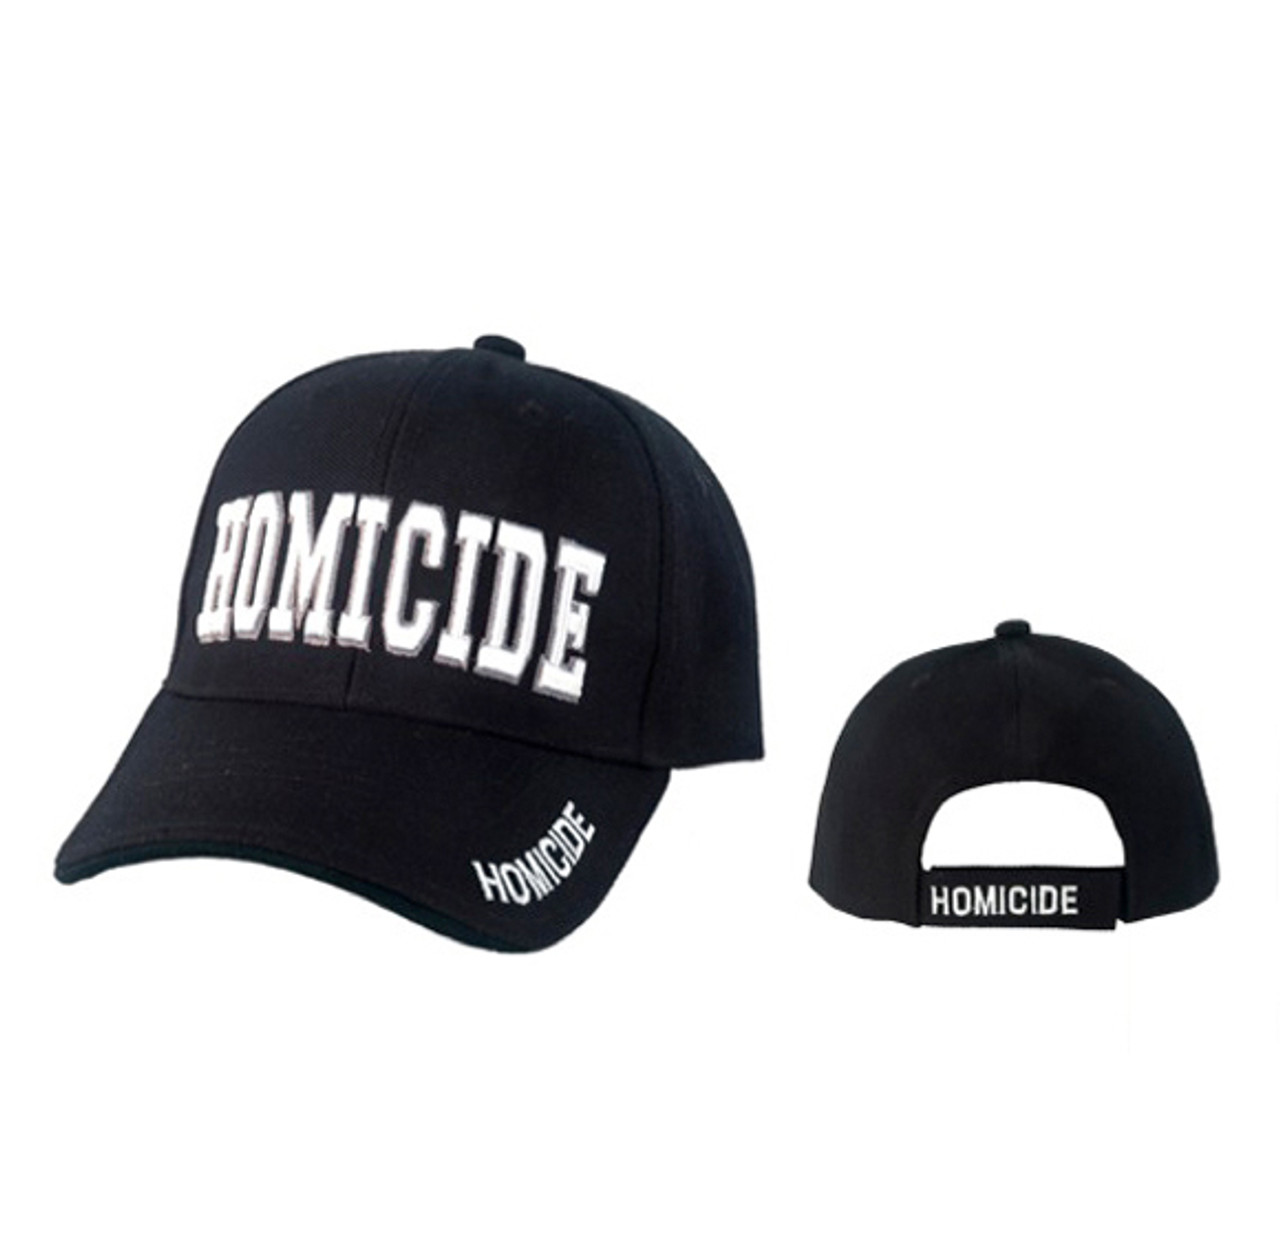 Black Homicide Baseball Hats C1045